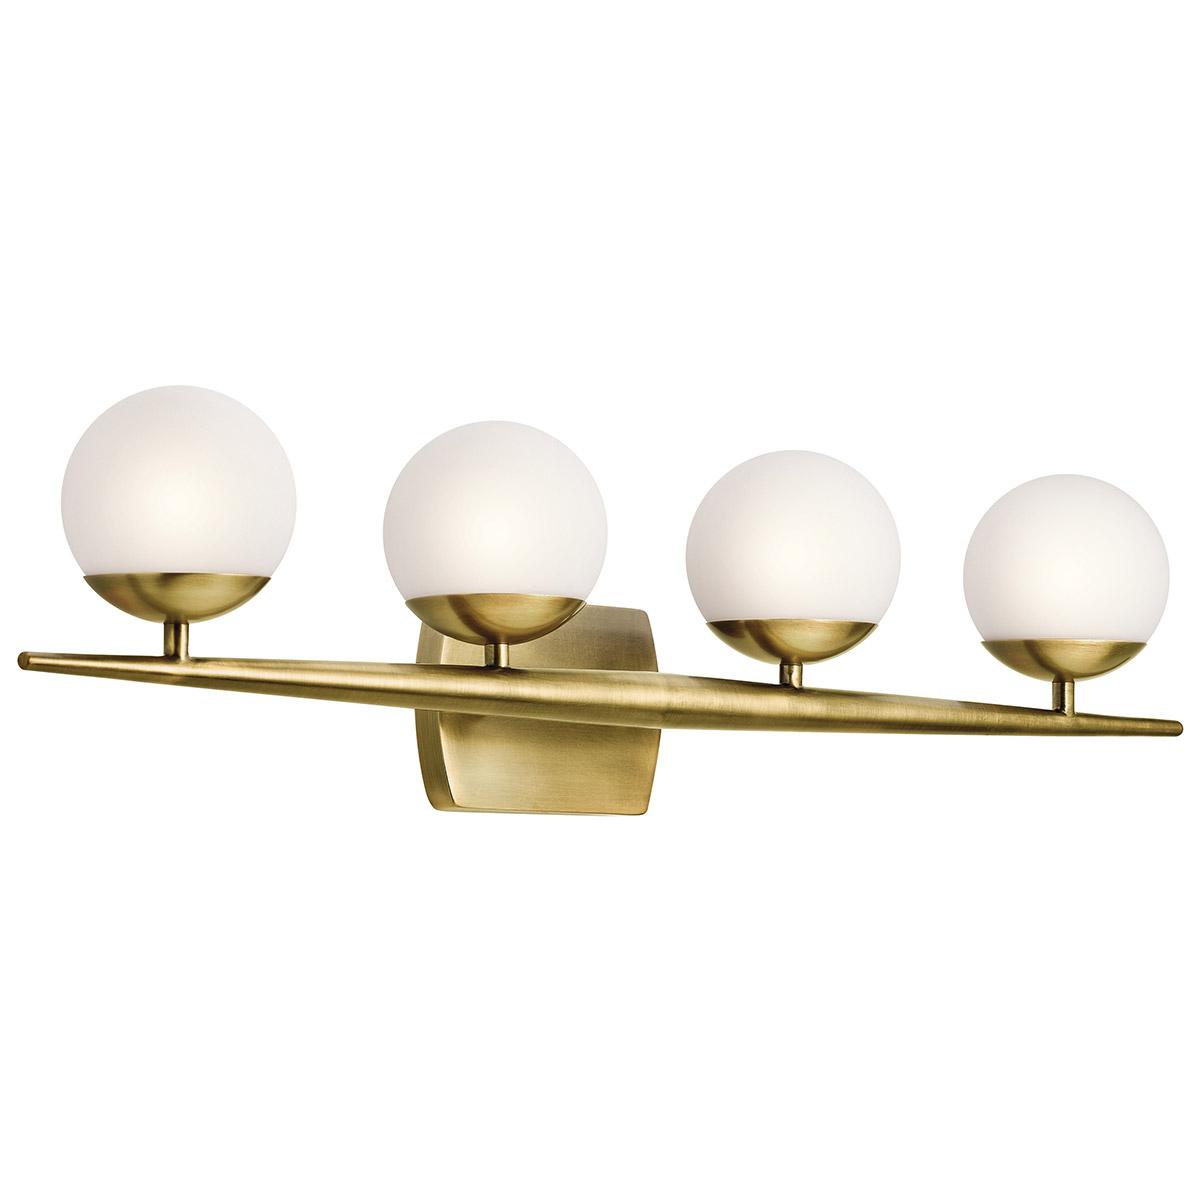 Kichler NBR Jasper Halogen Bathroom Vanity Light - Halogen bathroom vanity lights